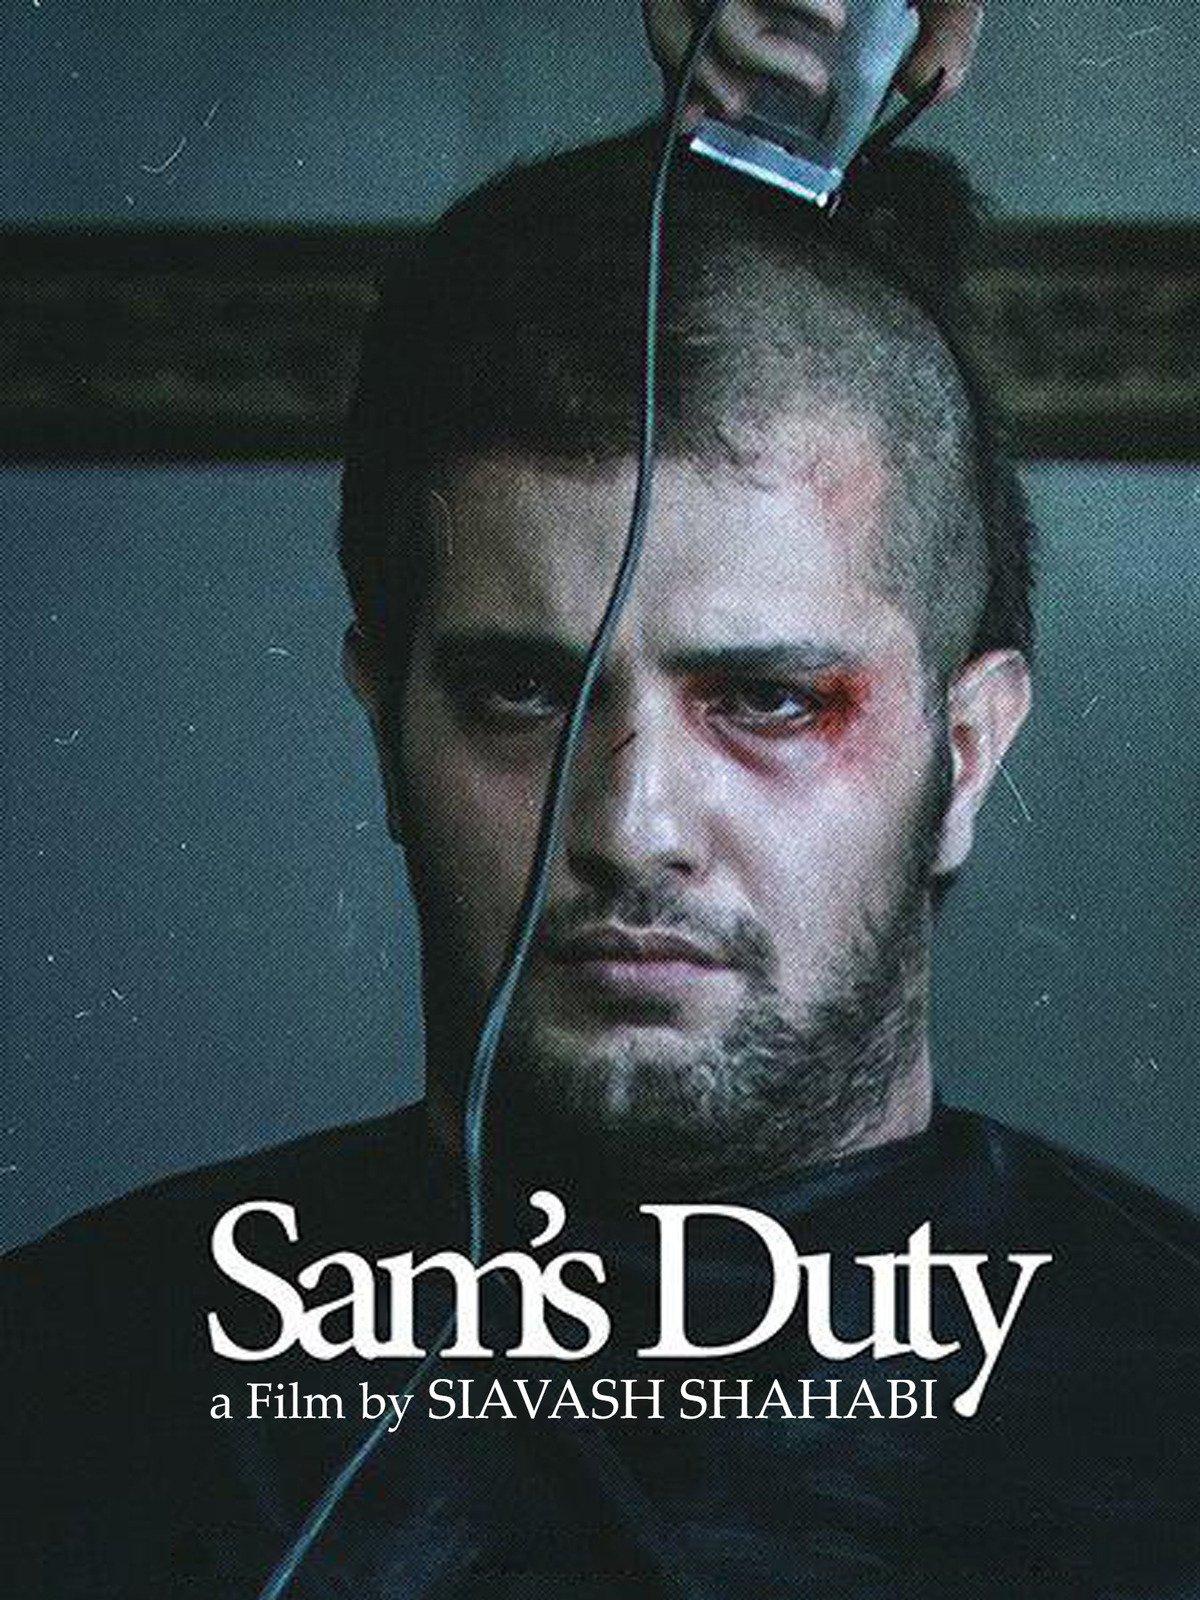 Sam's Duty